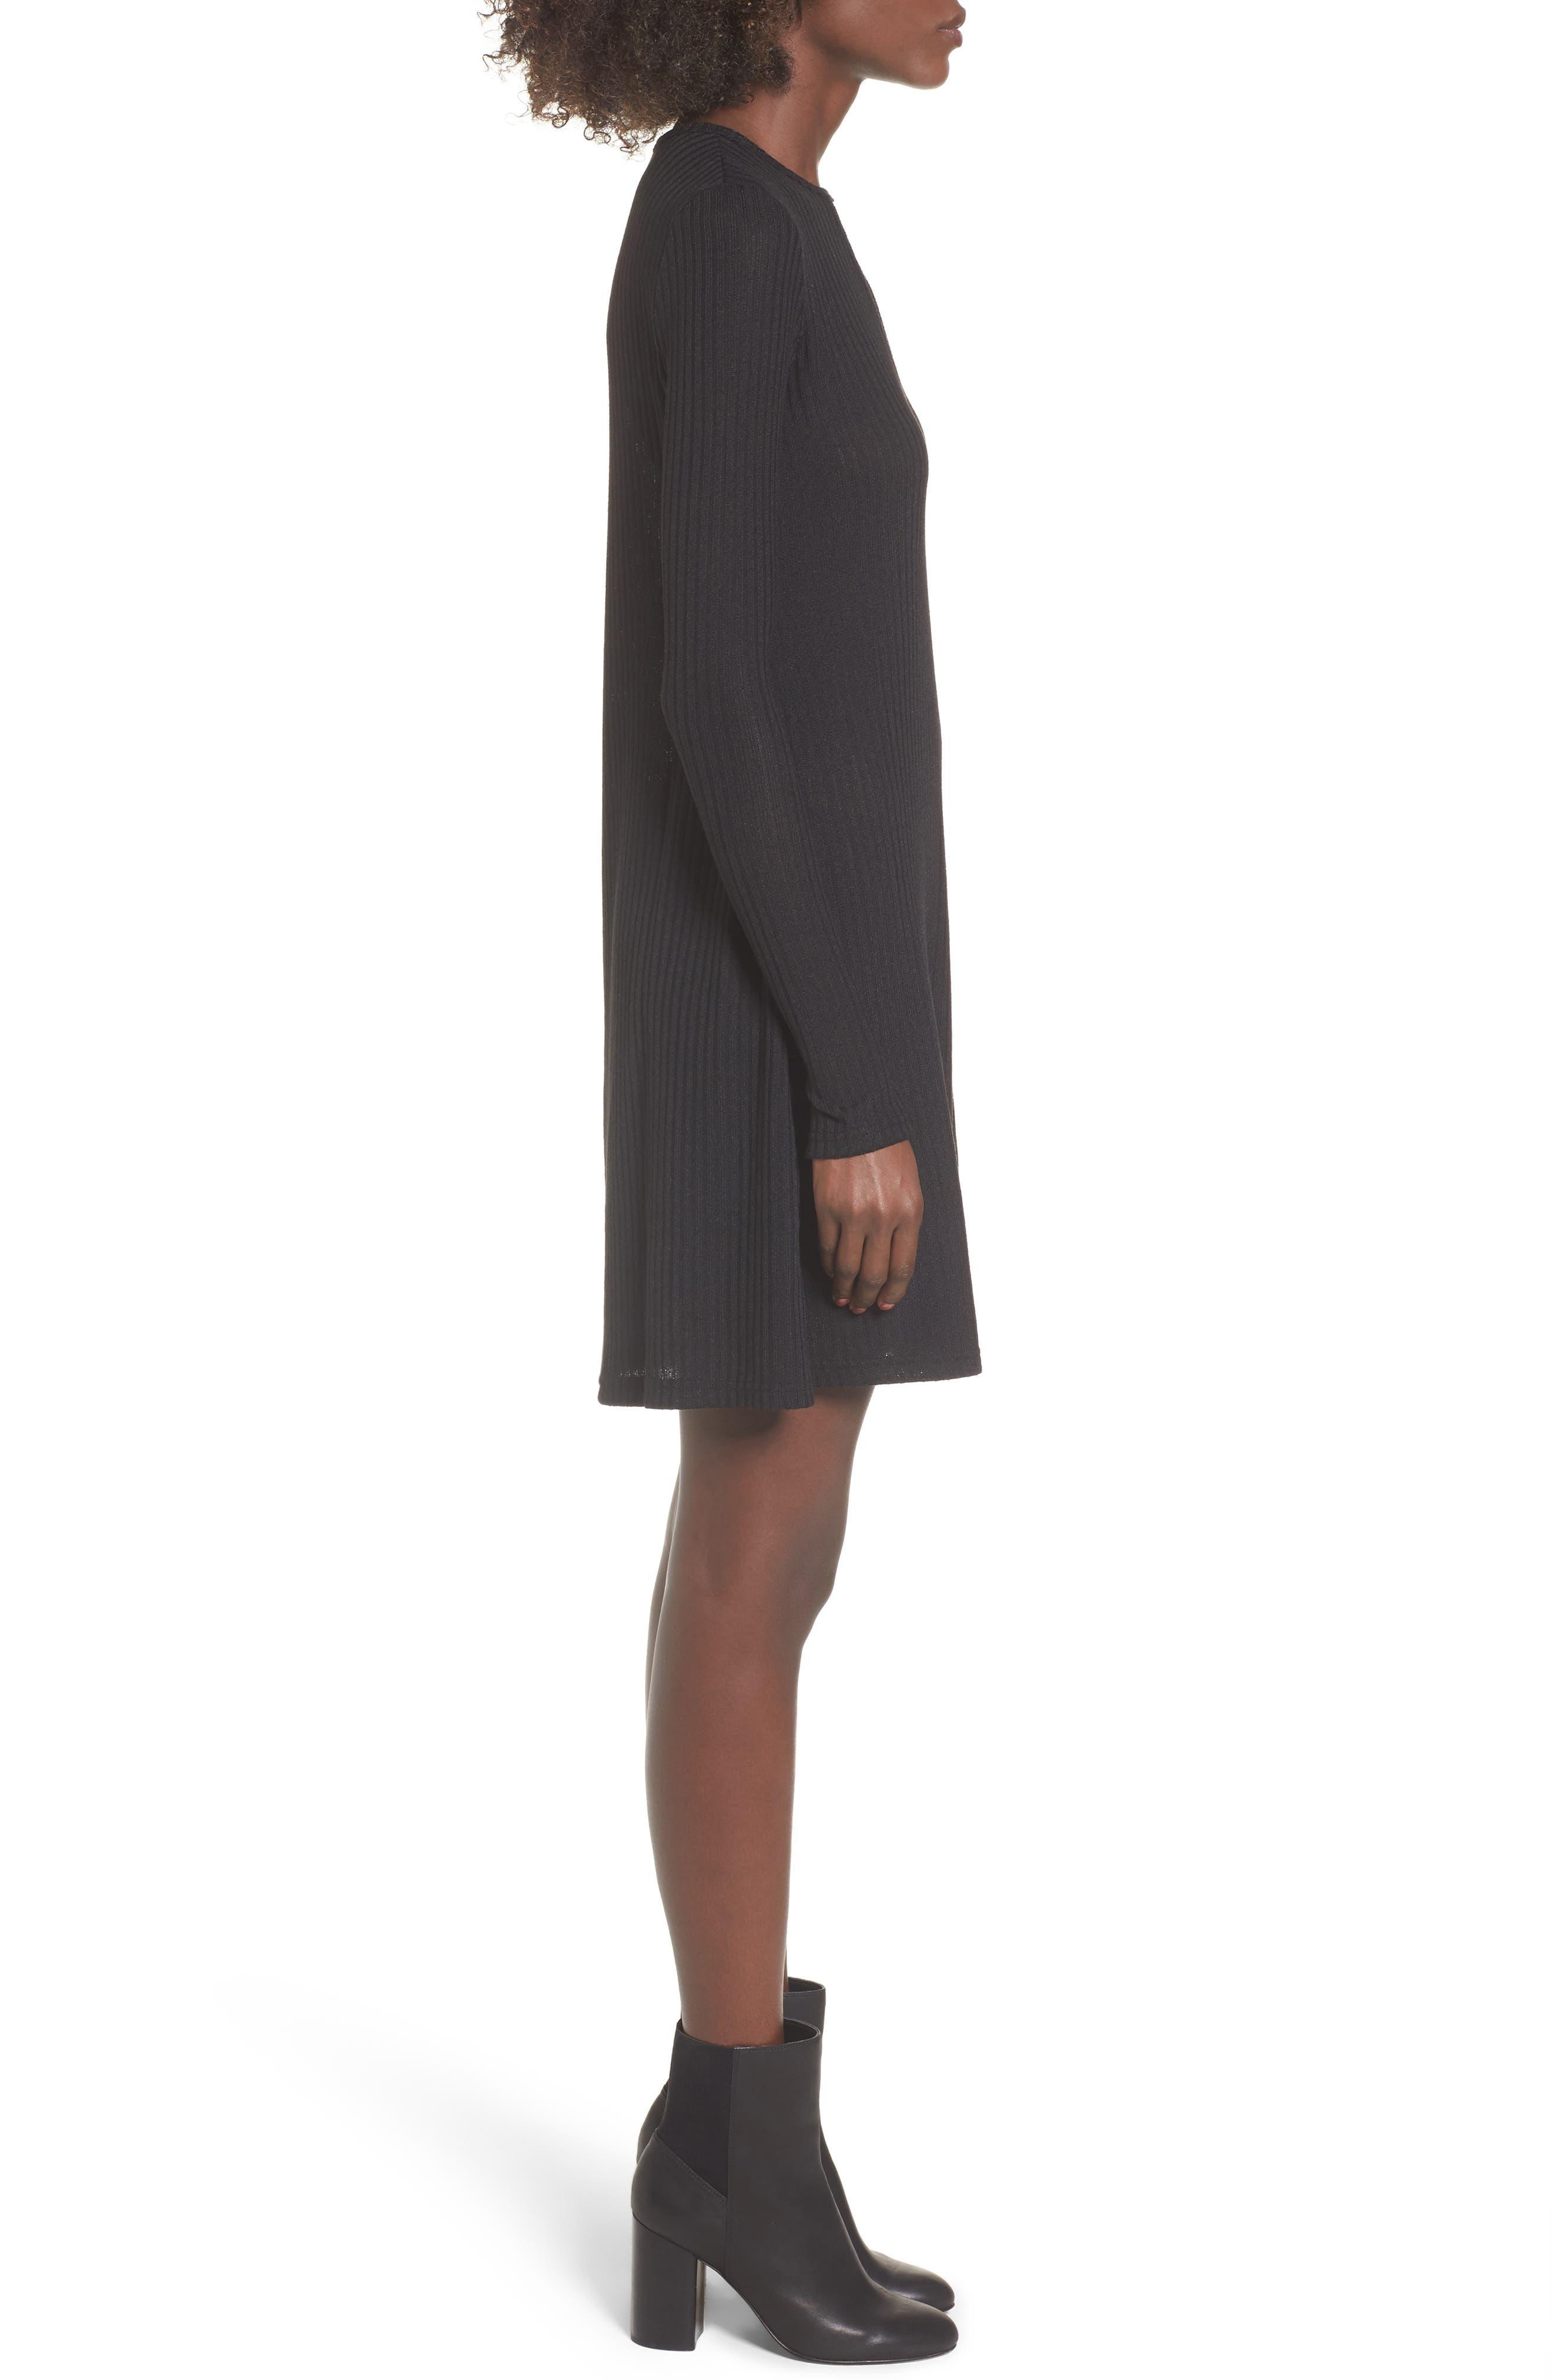 Maven Thermal Dress,                             Alternate thumbnail 3, color,                             001